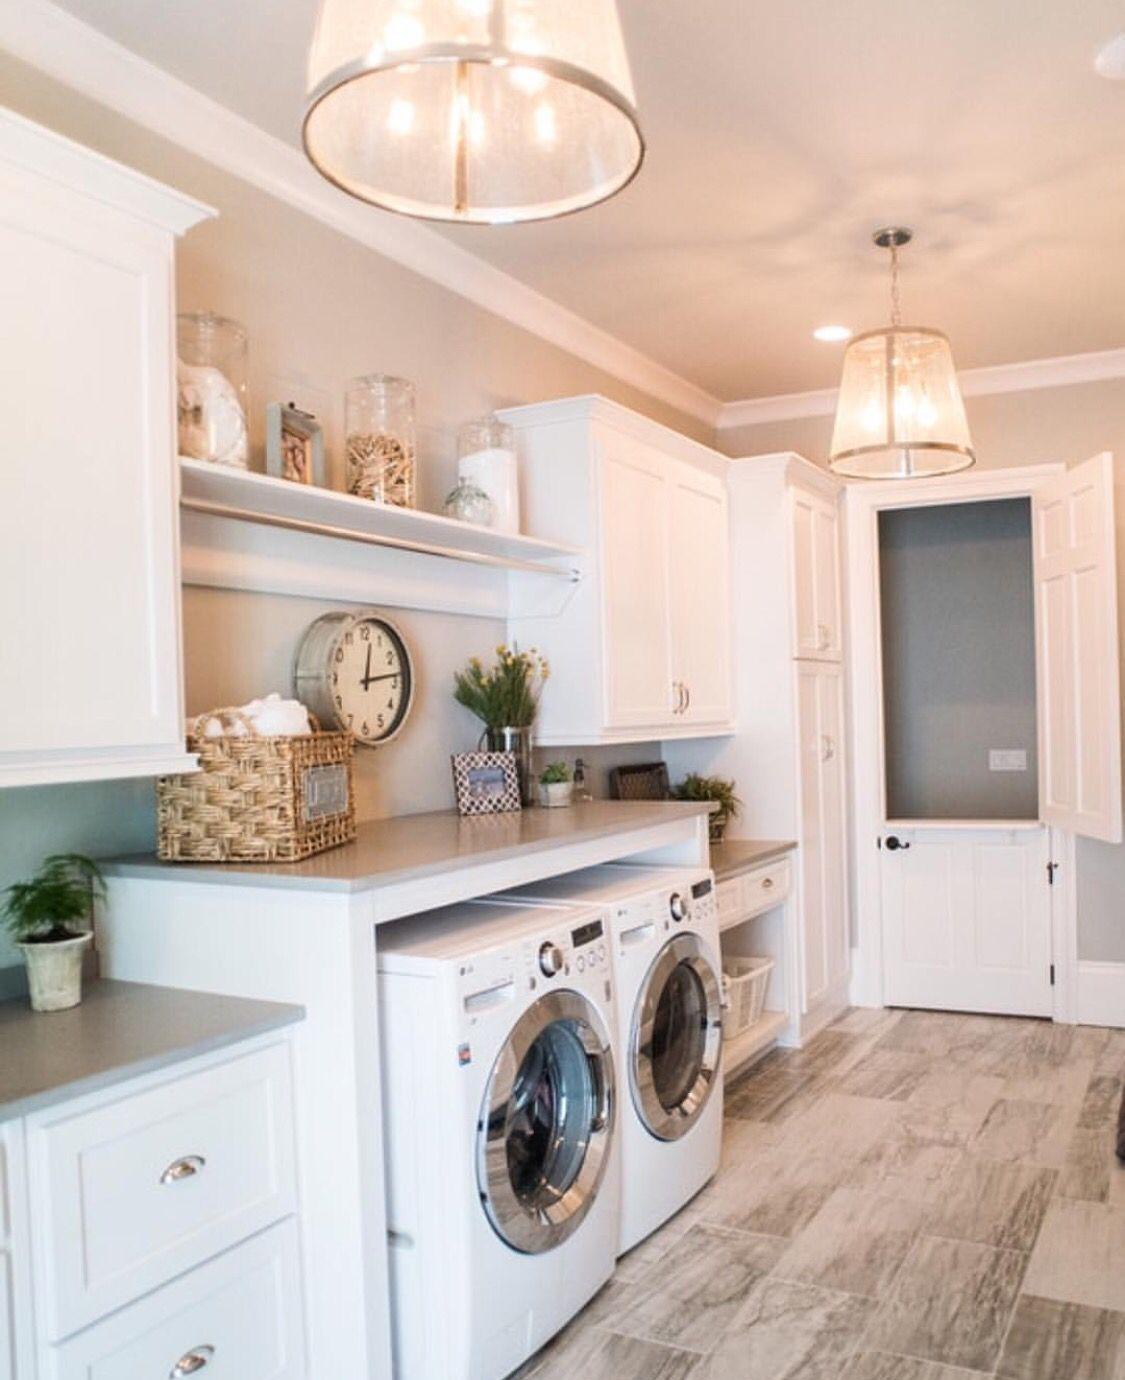 Laundry Room My Home Ideas Pinterest Lavar Casas Y Interiores ~ Lavar Cortinas Blancas Muy Sucias